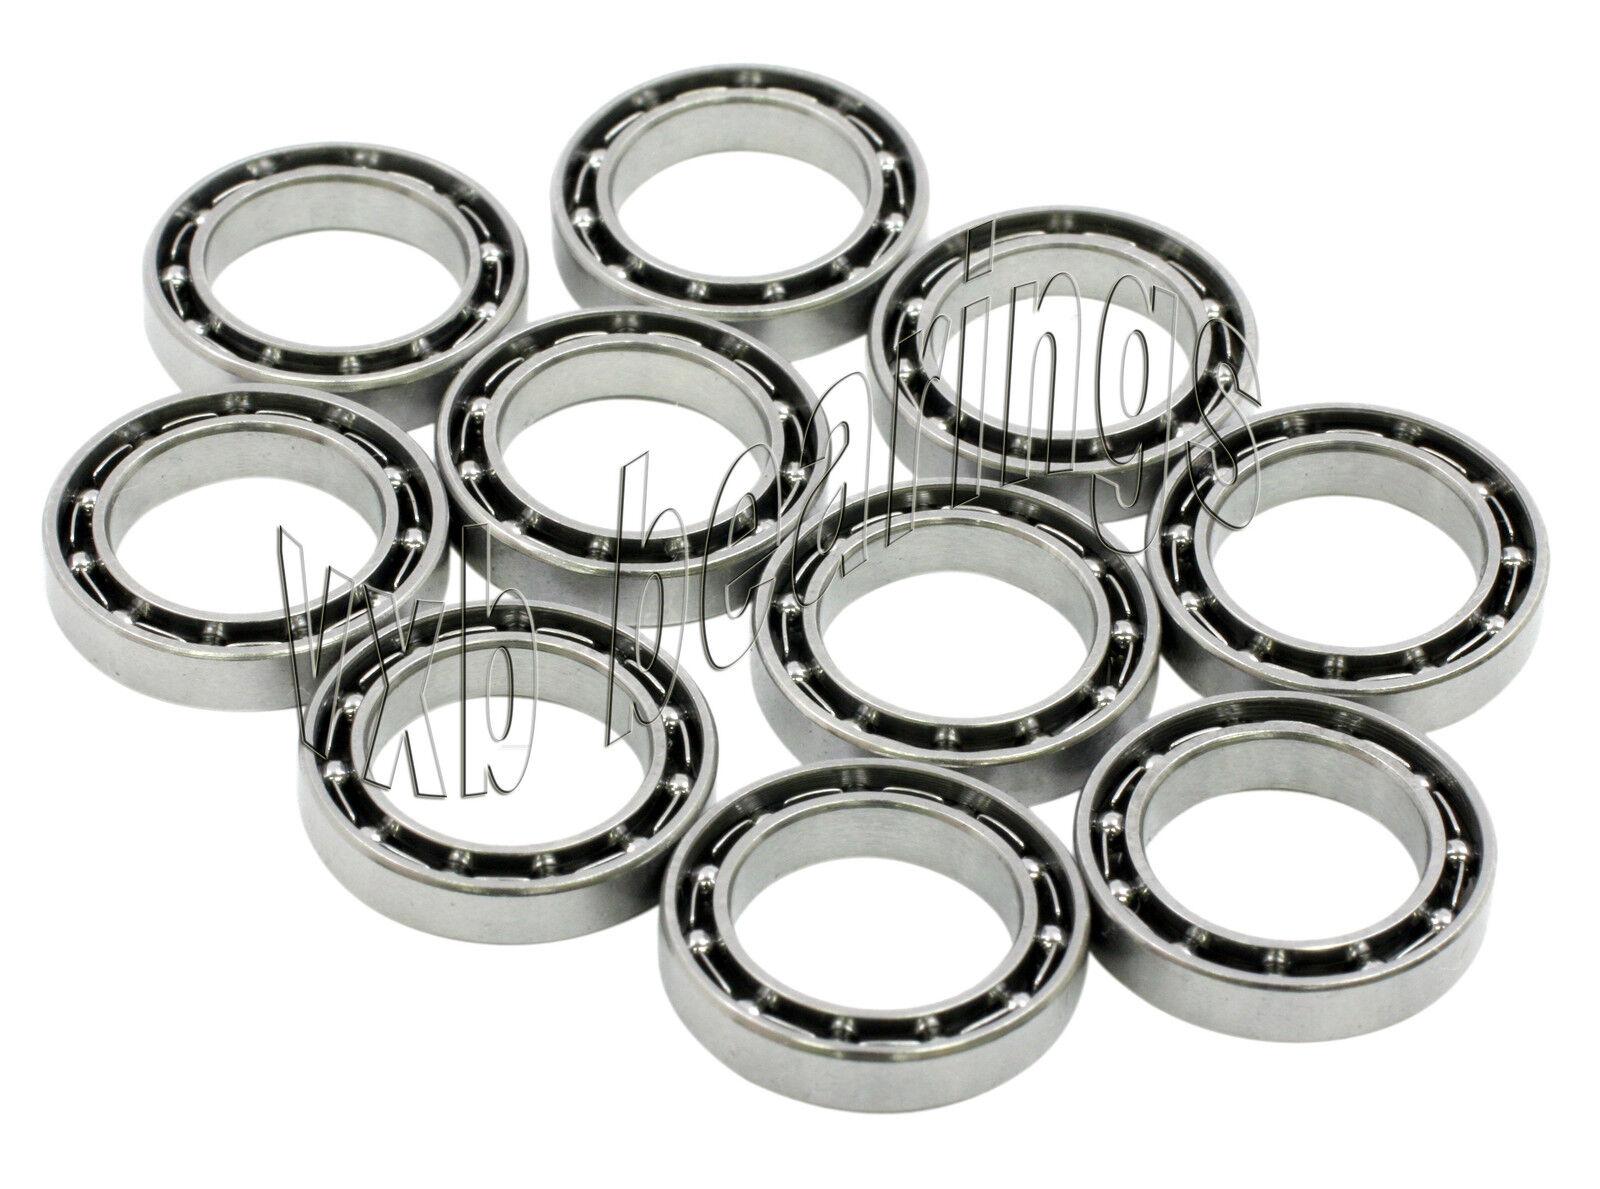 10 Ball Bearings 2x5x2 mm Stainless Steel 2x5 Bearing